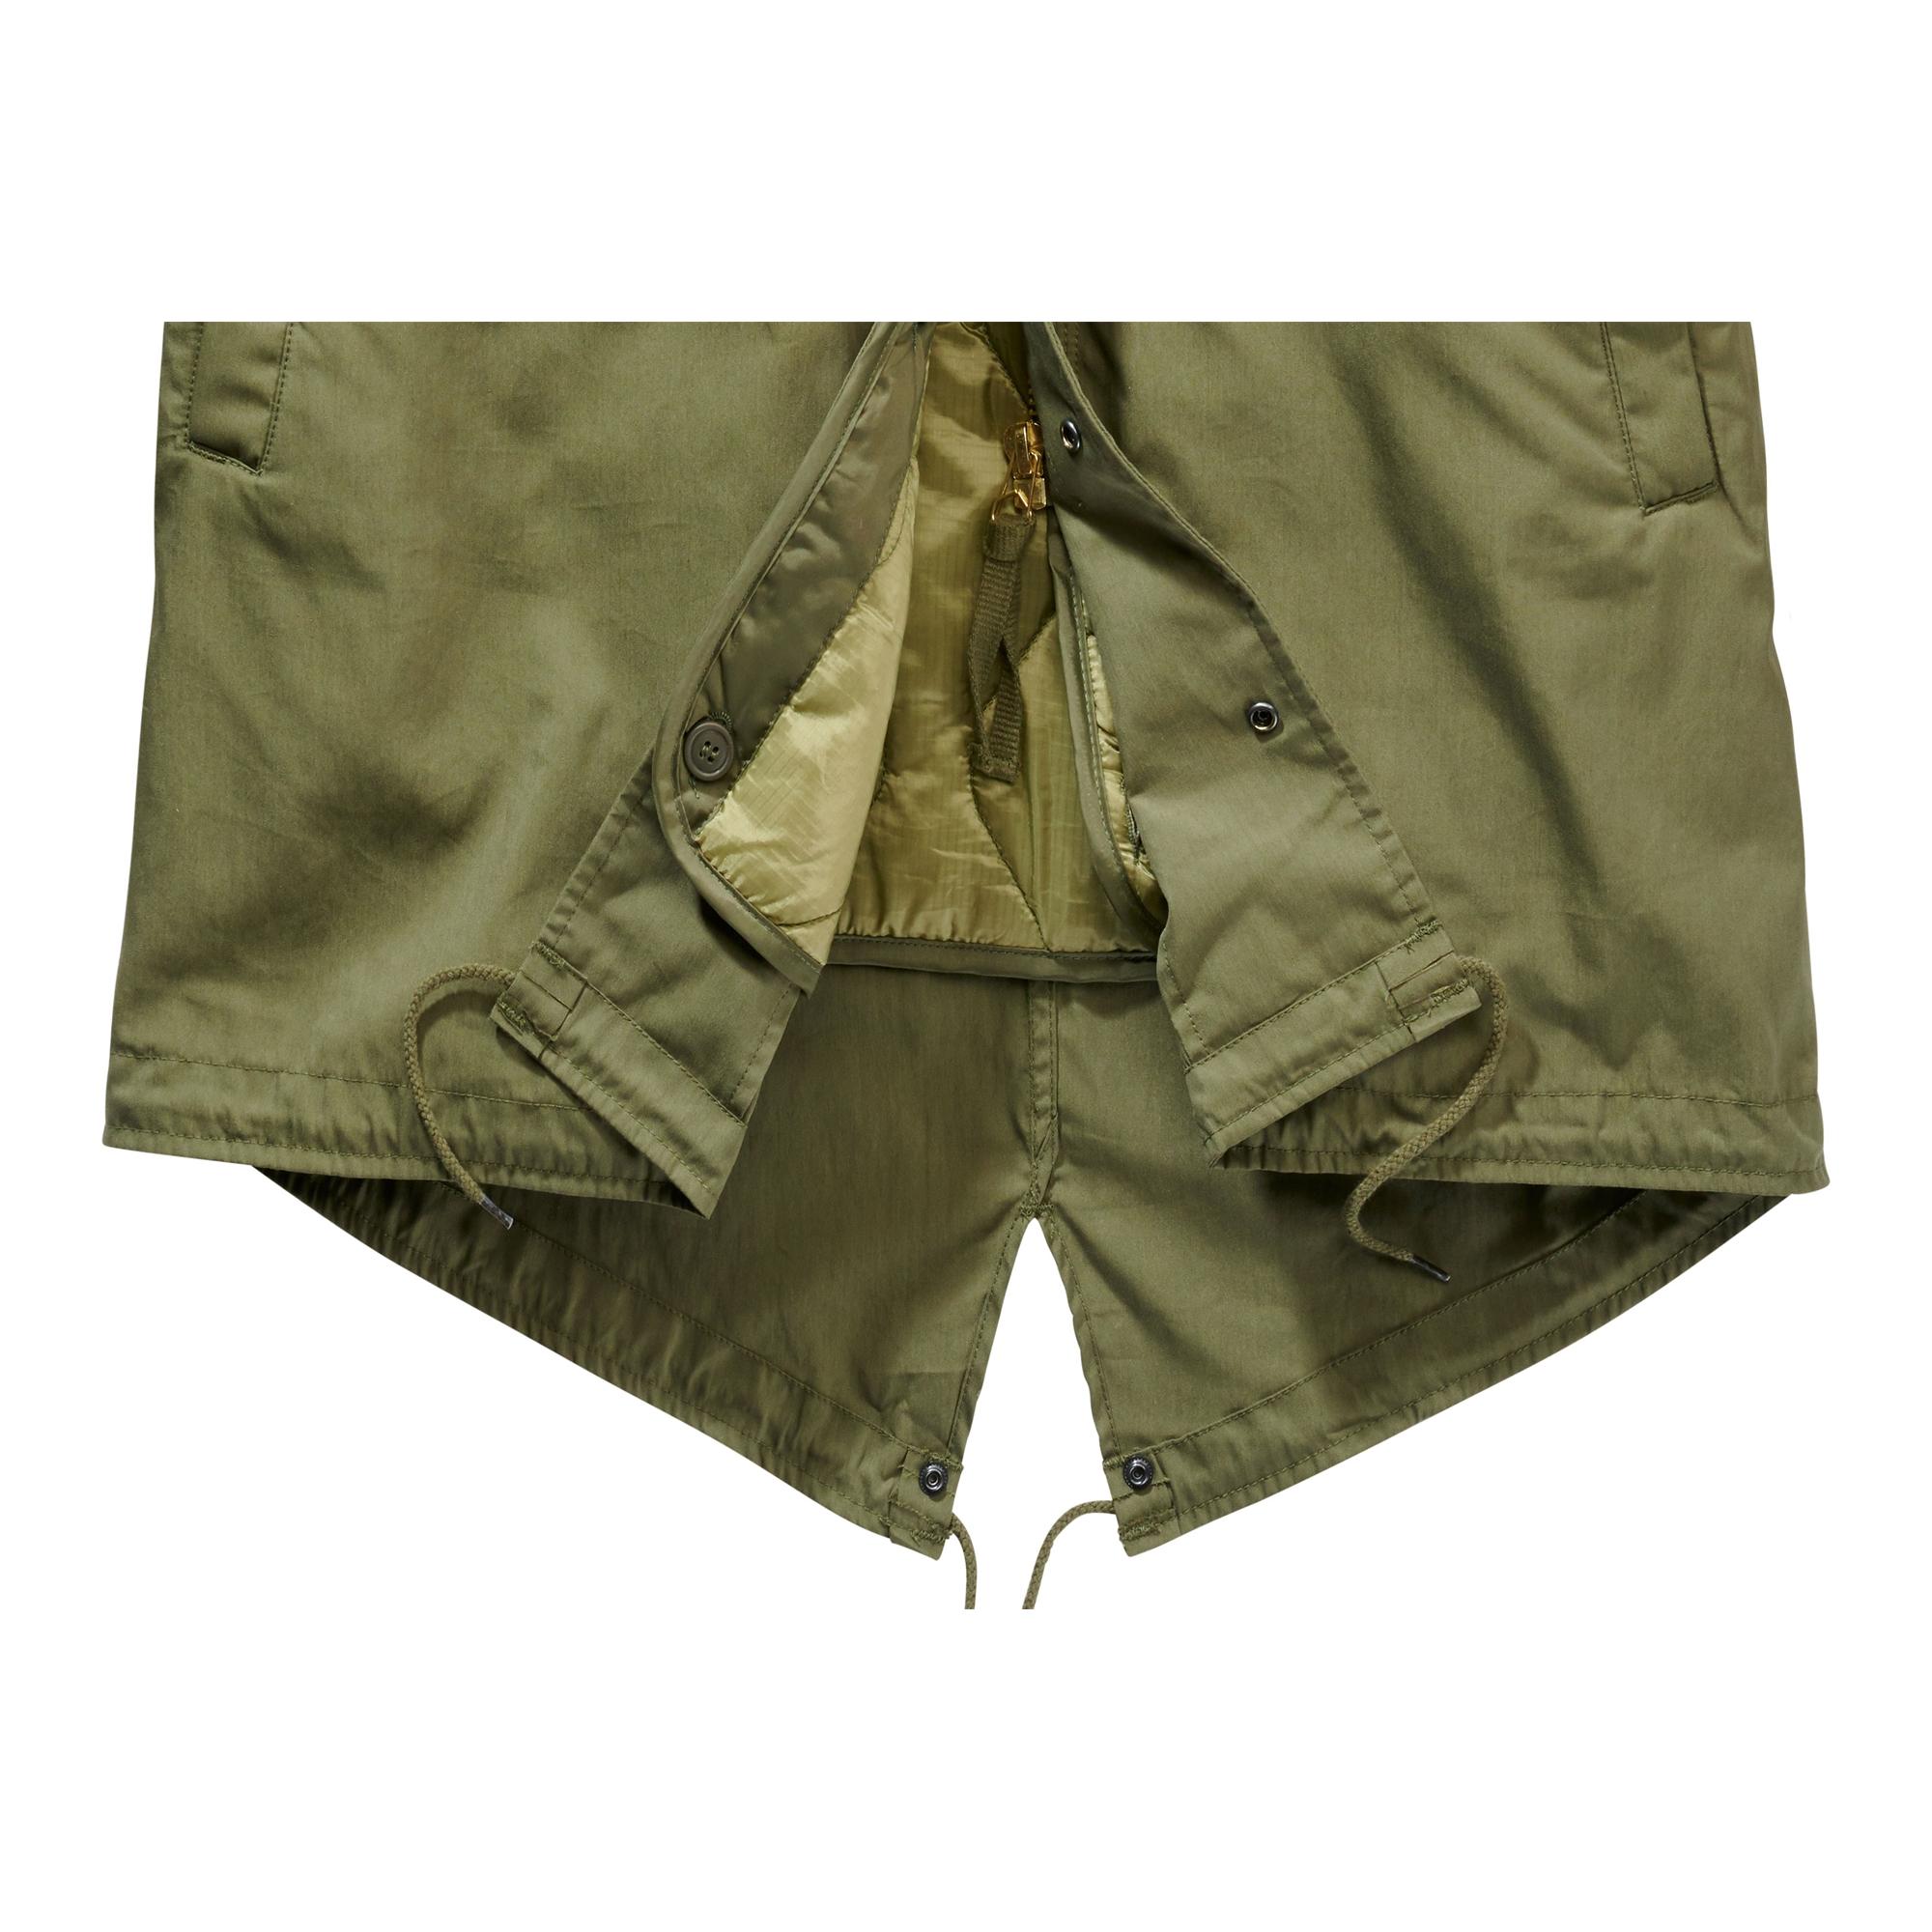 Indexbild 10 - Brandit US M51 Parka Winterjacke Fishtail Jacke Gefüttert Armee S-5XL